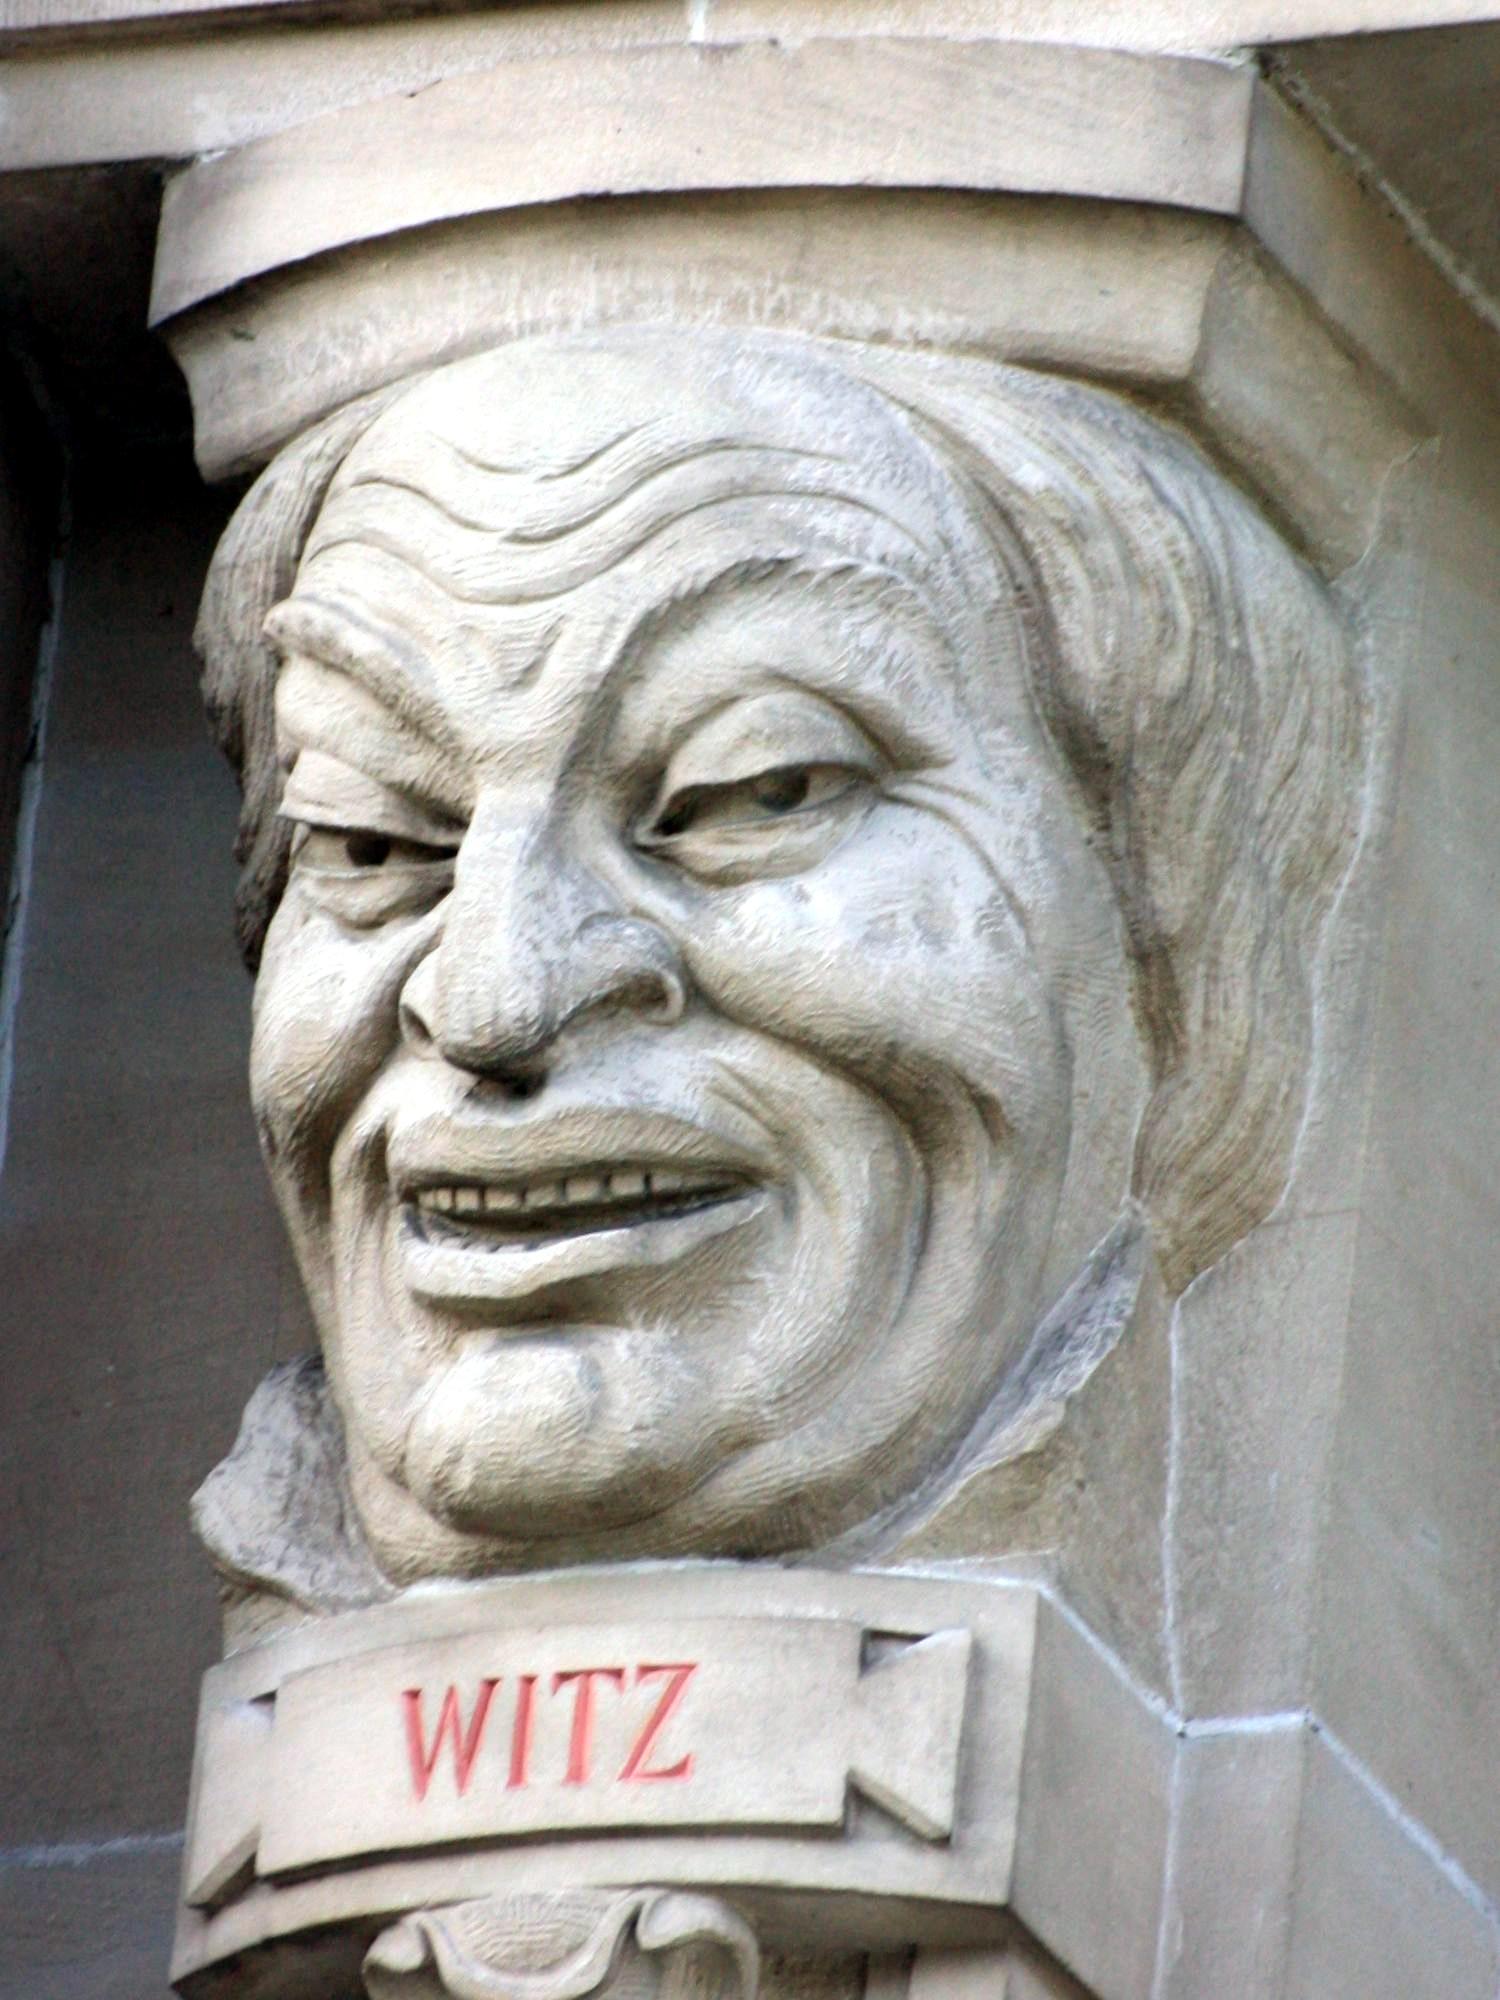 Mittelalter witze